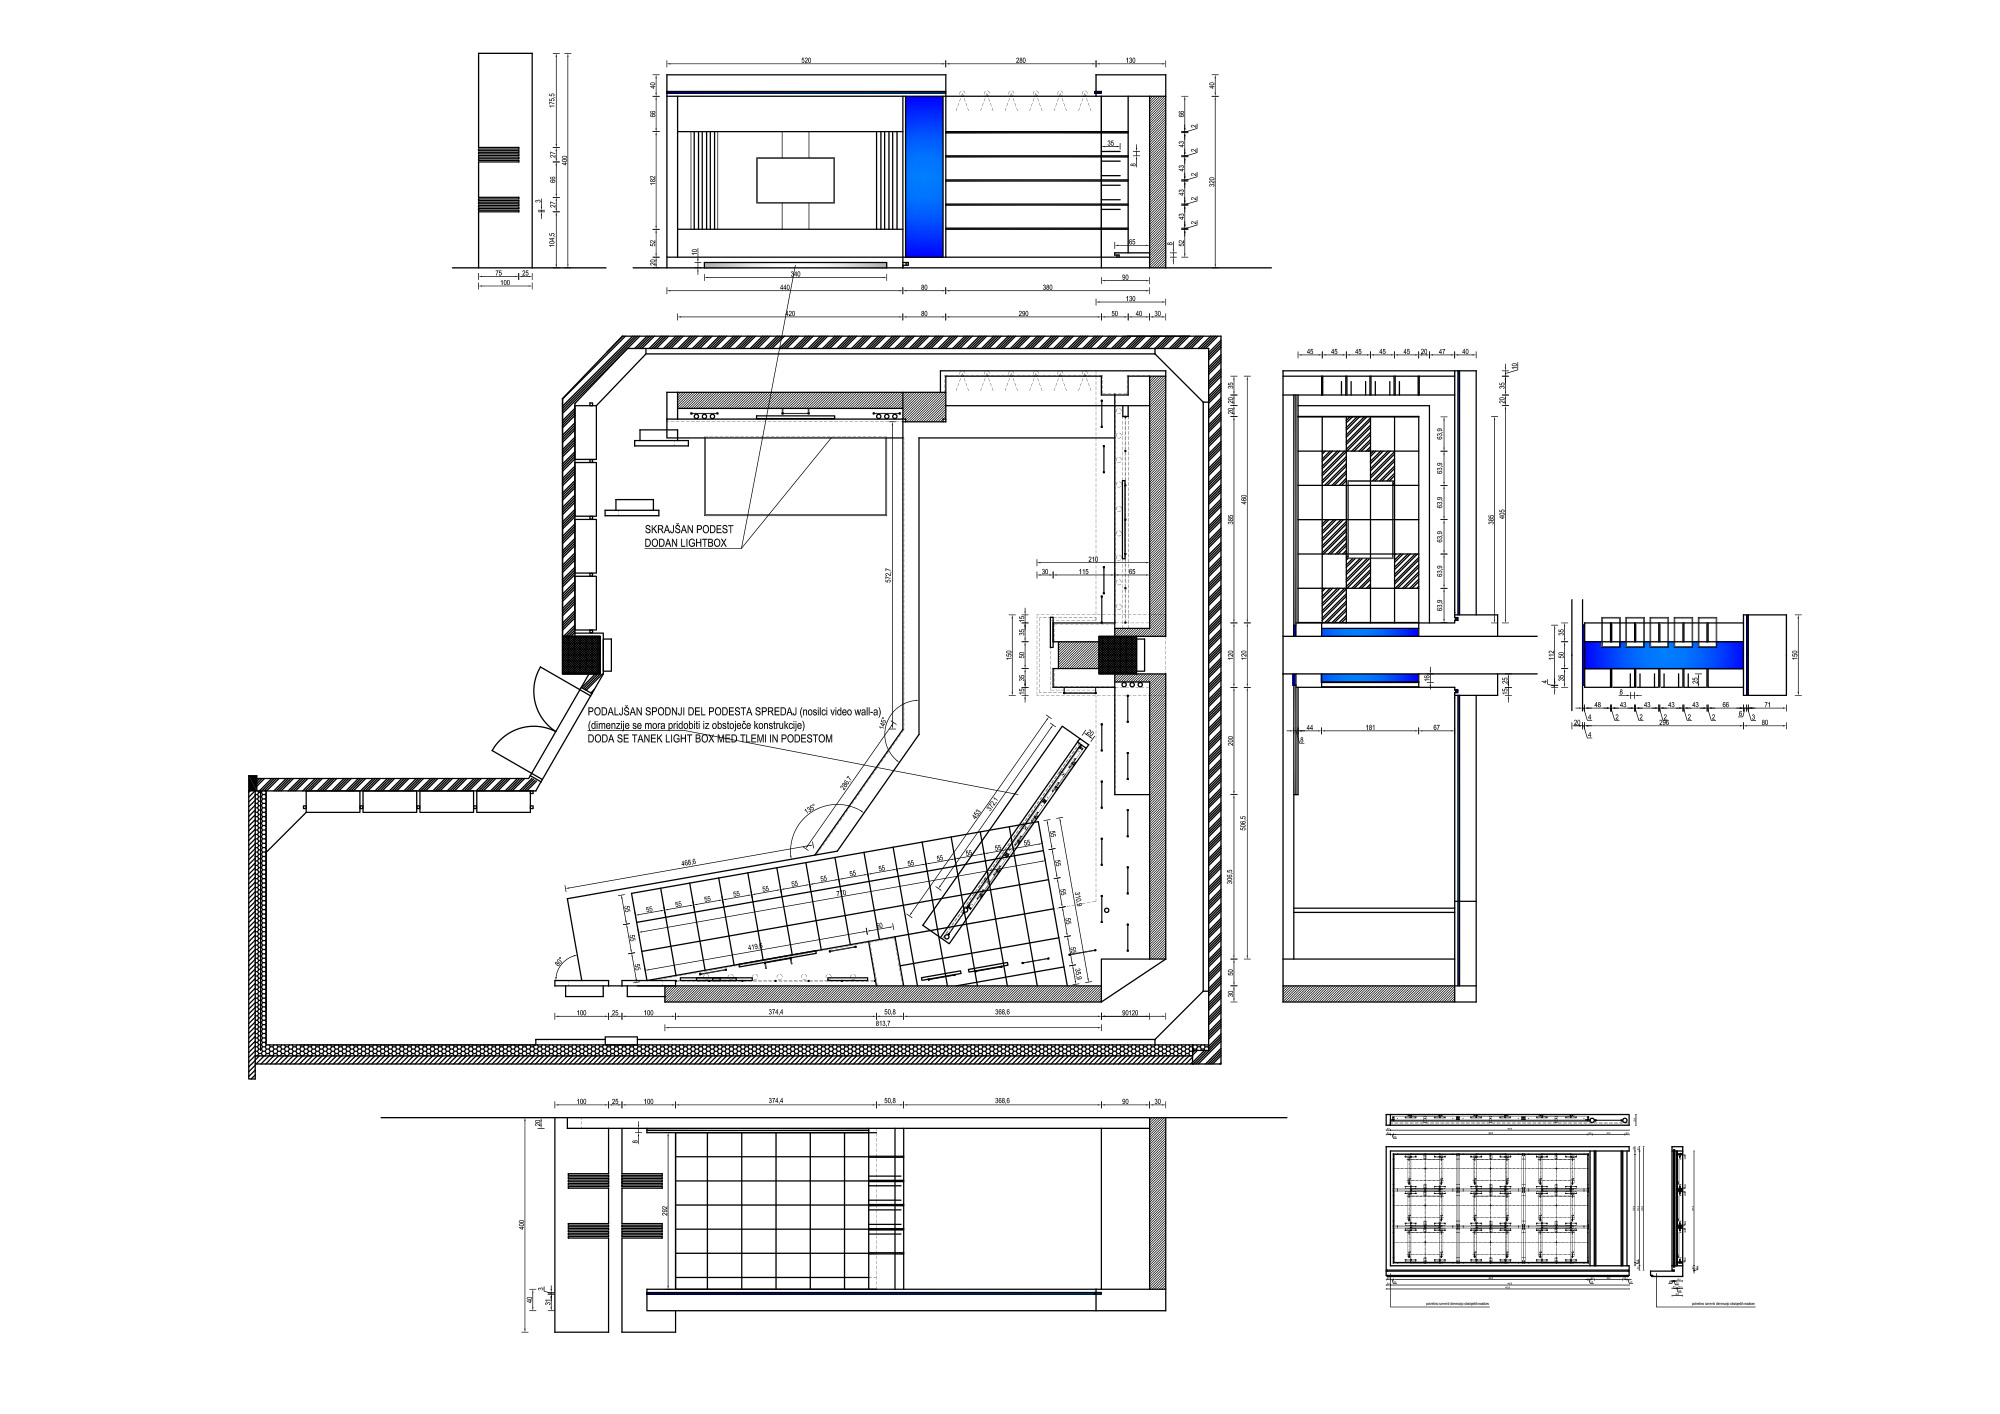 D:WORKTEMMA X2014PLANET TV2014-06-17tloris 5 - za boštjan